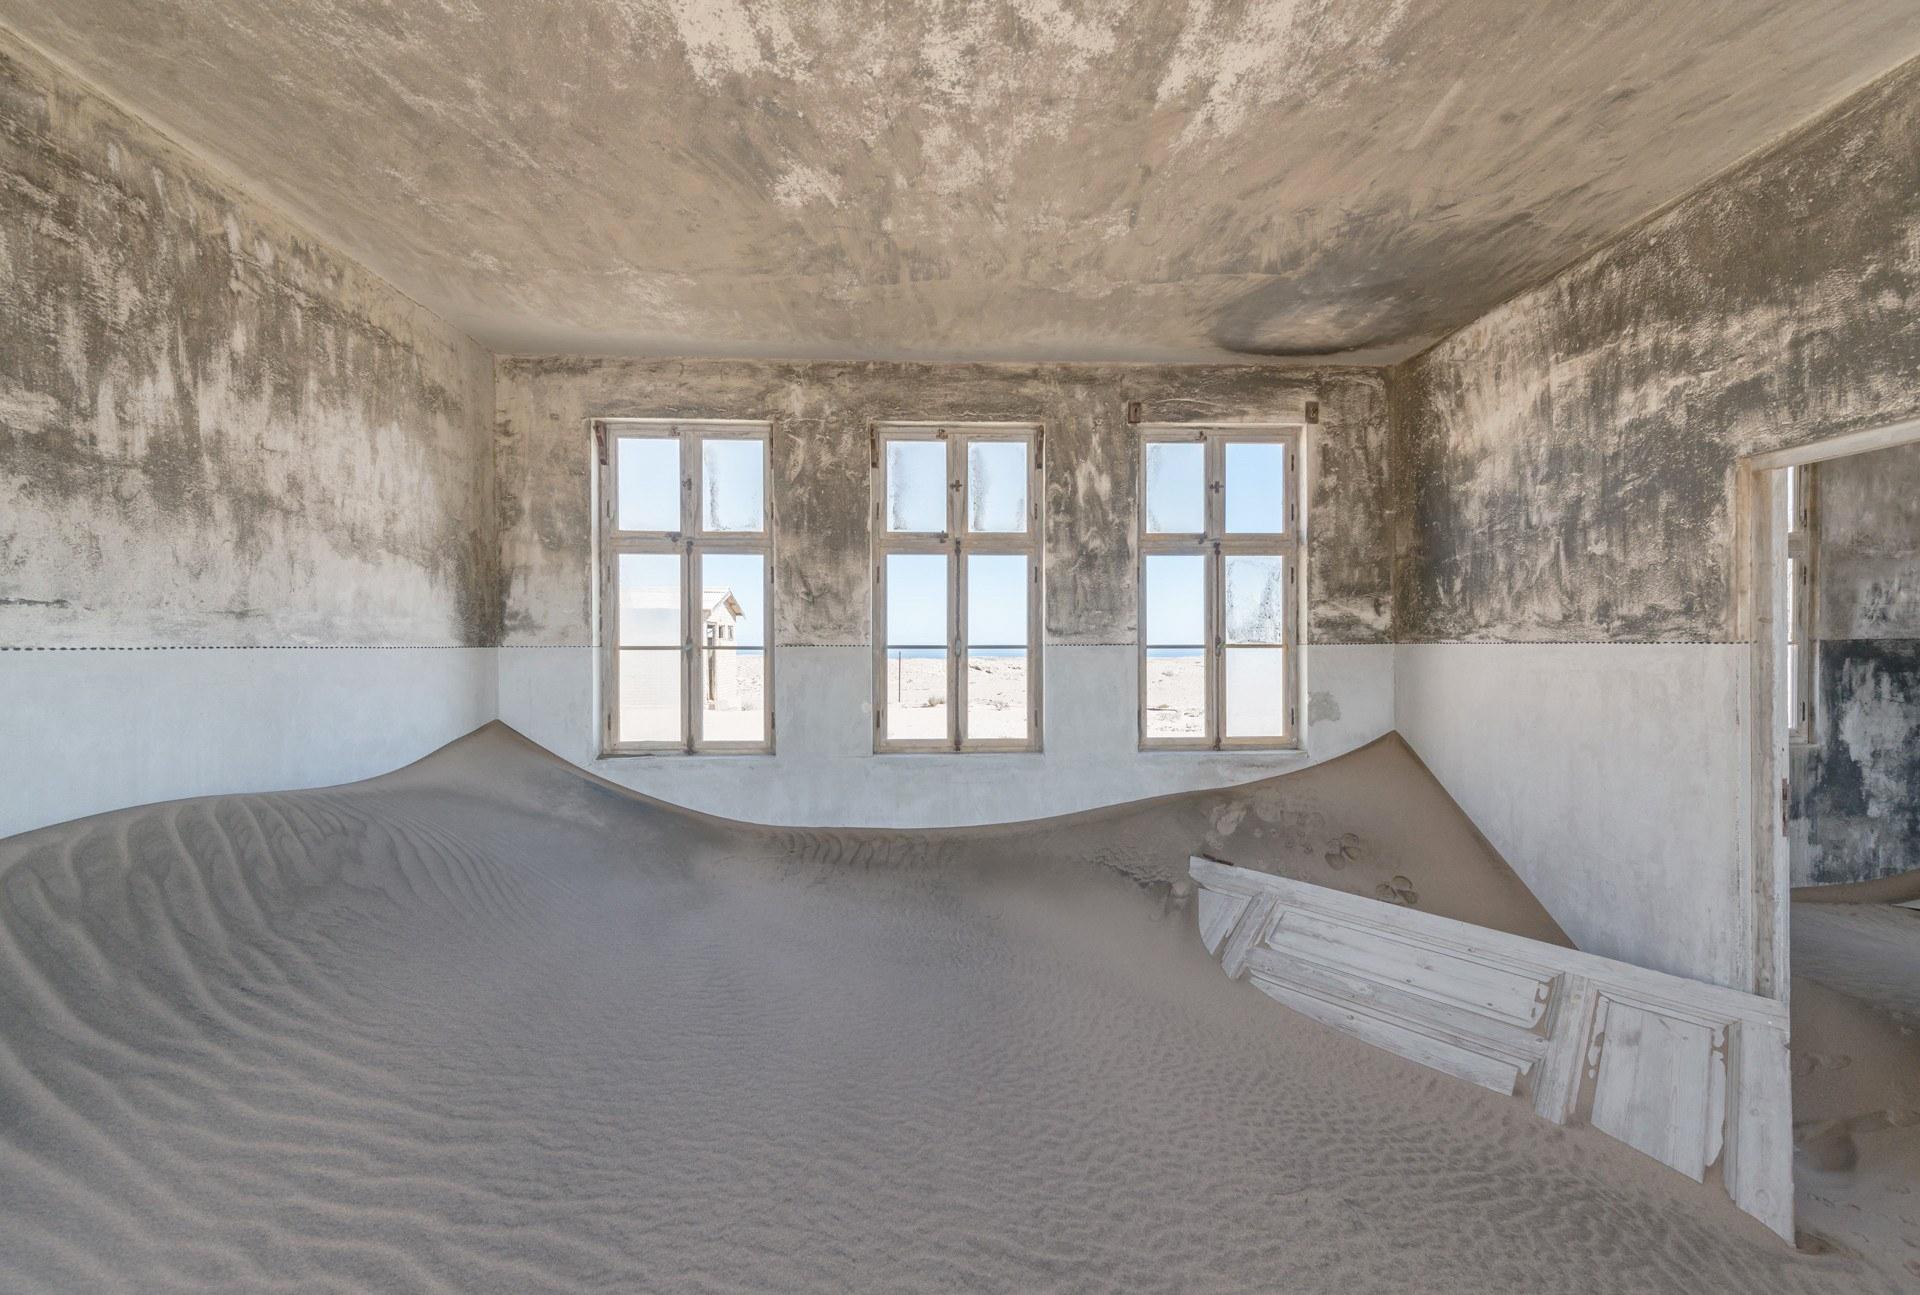 Kolmanskop - Photographie © Romain Veillon